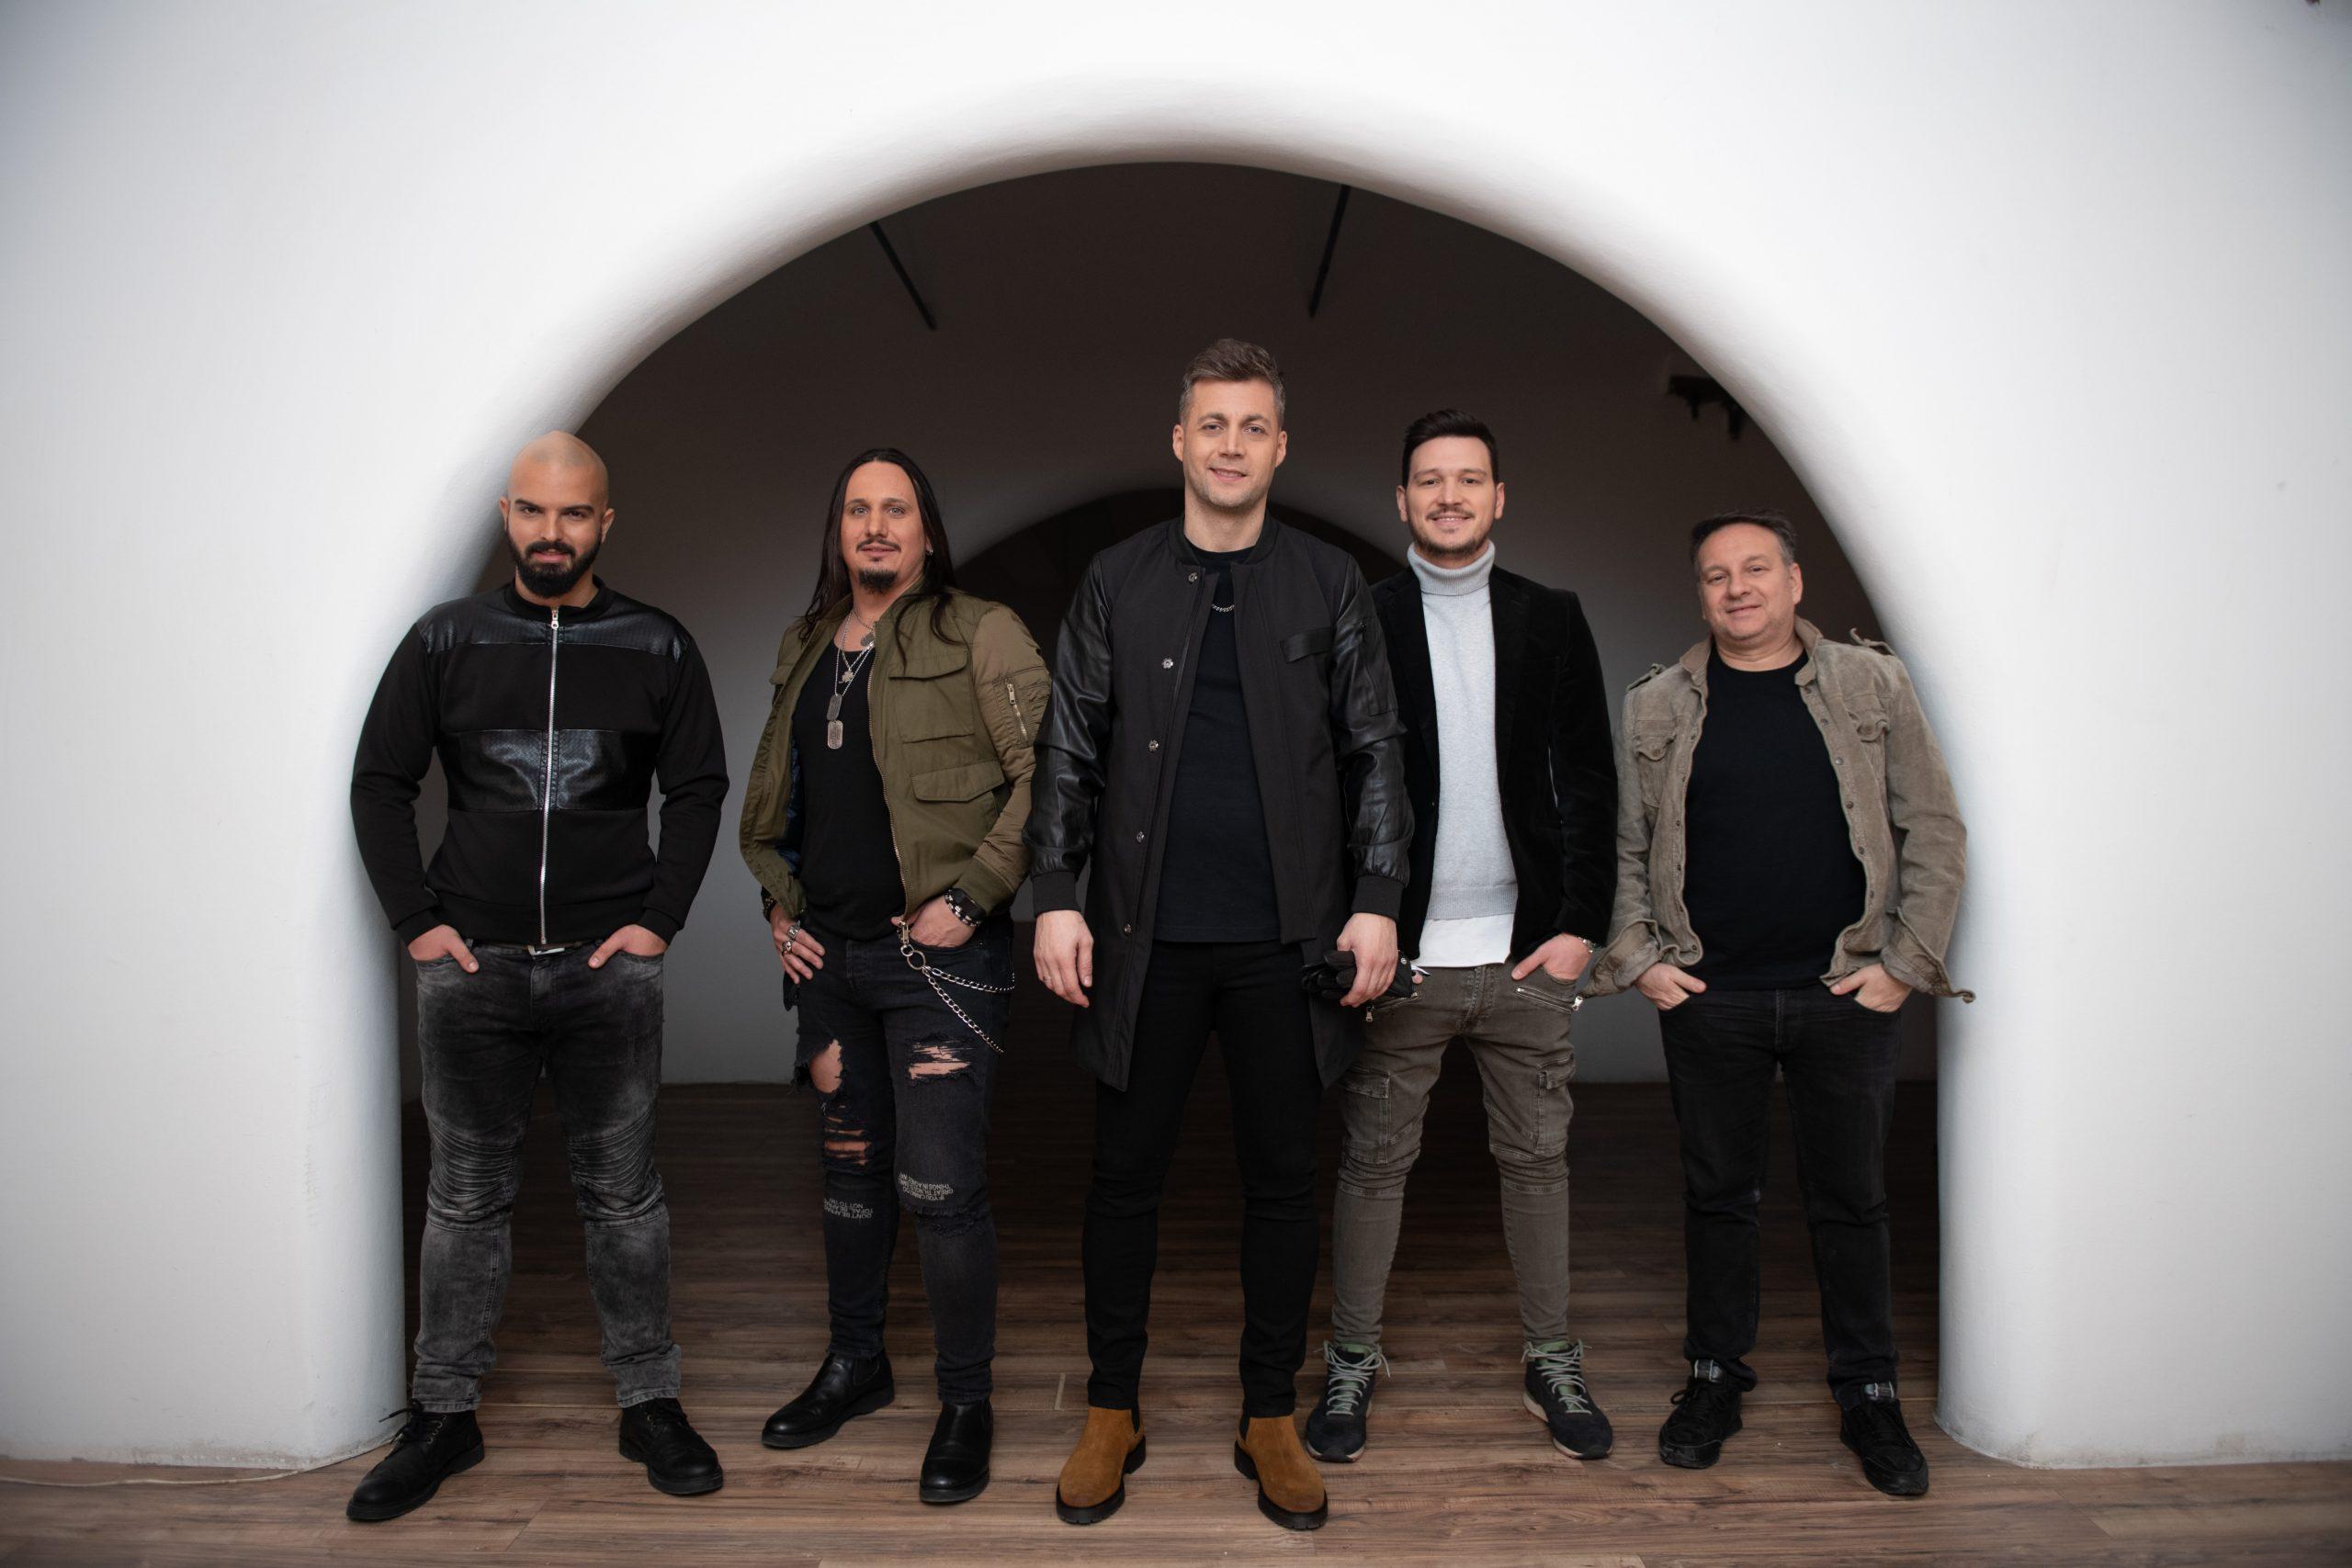 Lexington Band ima novu pjesmu